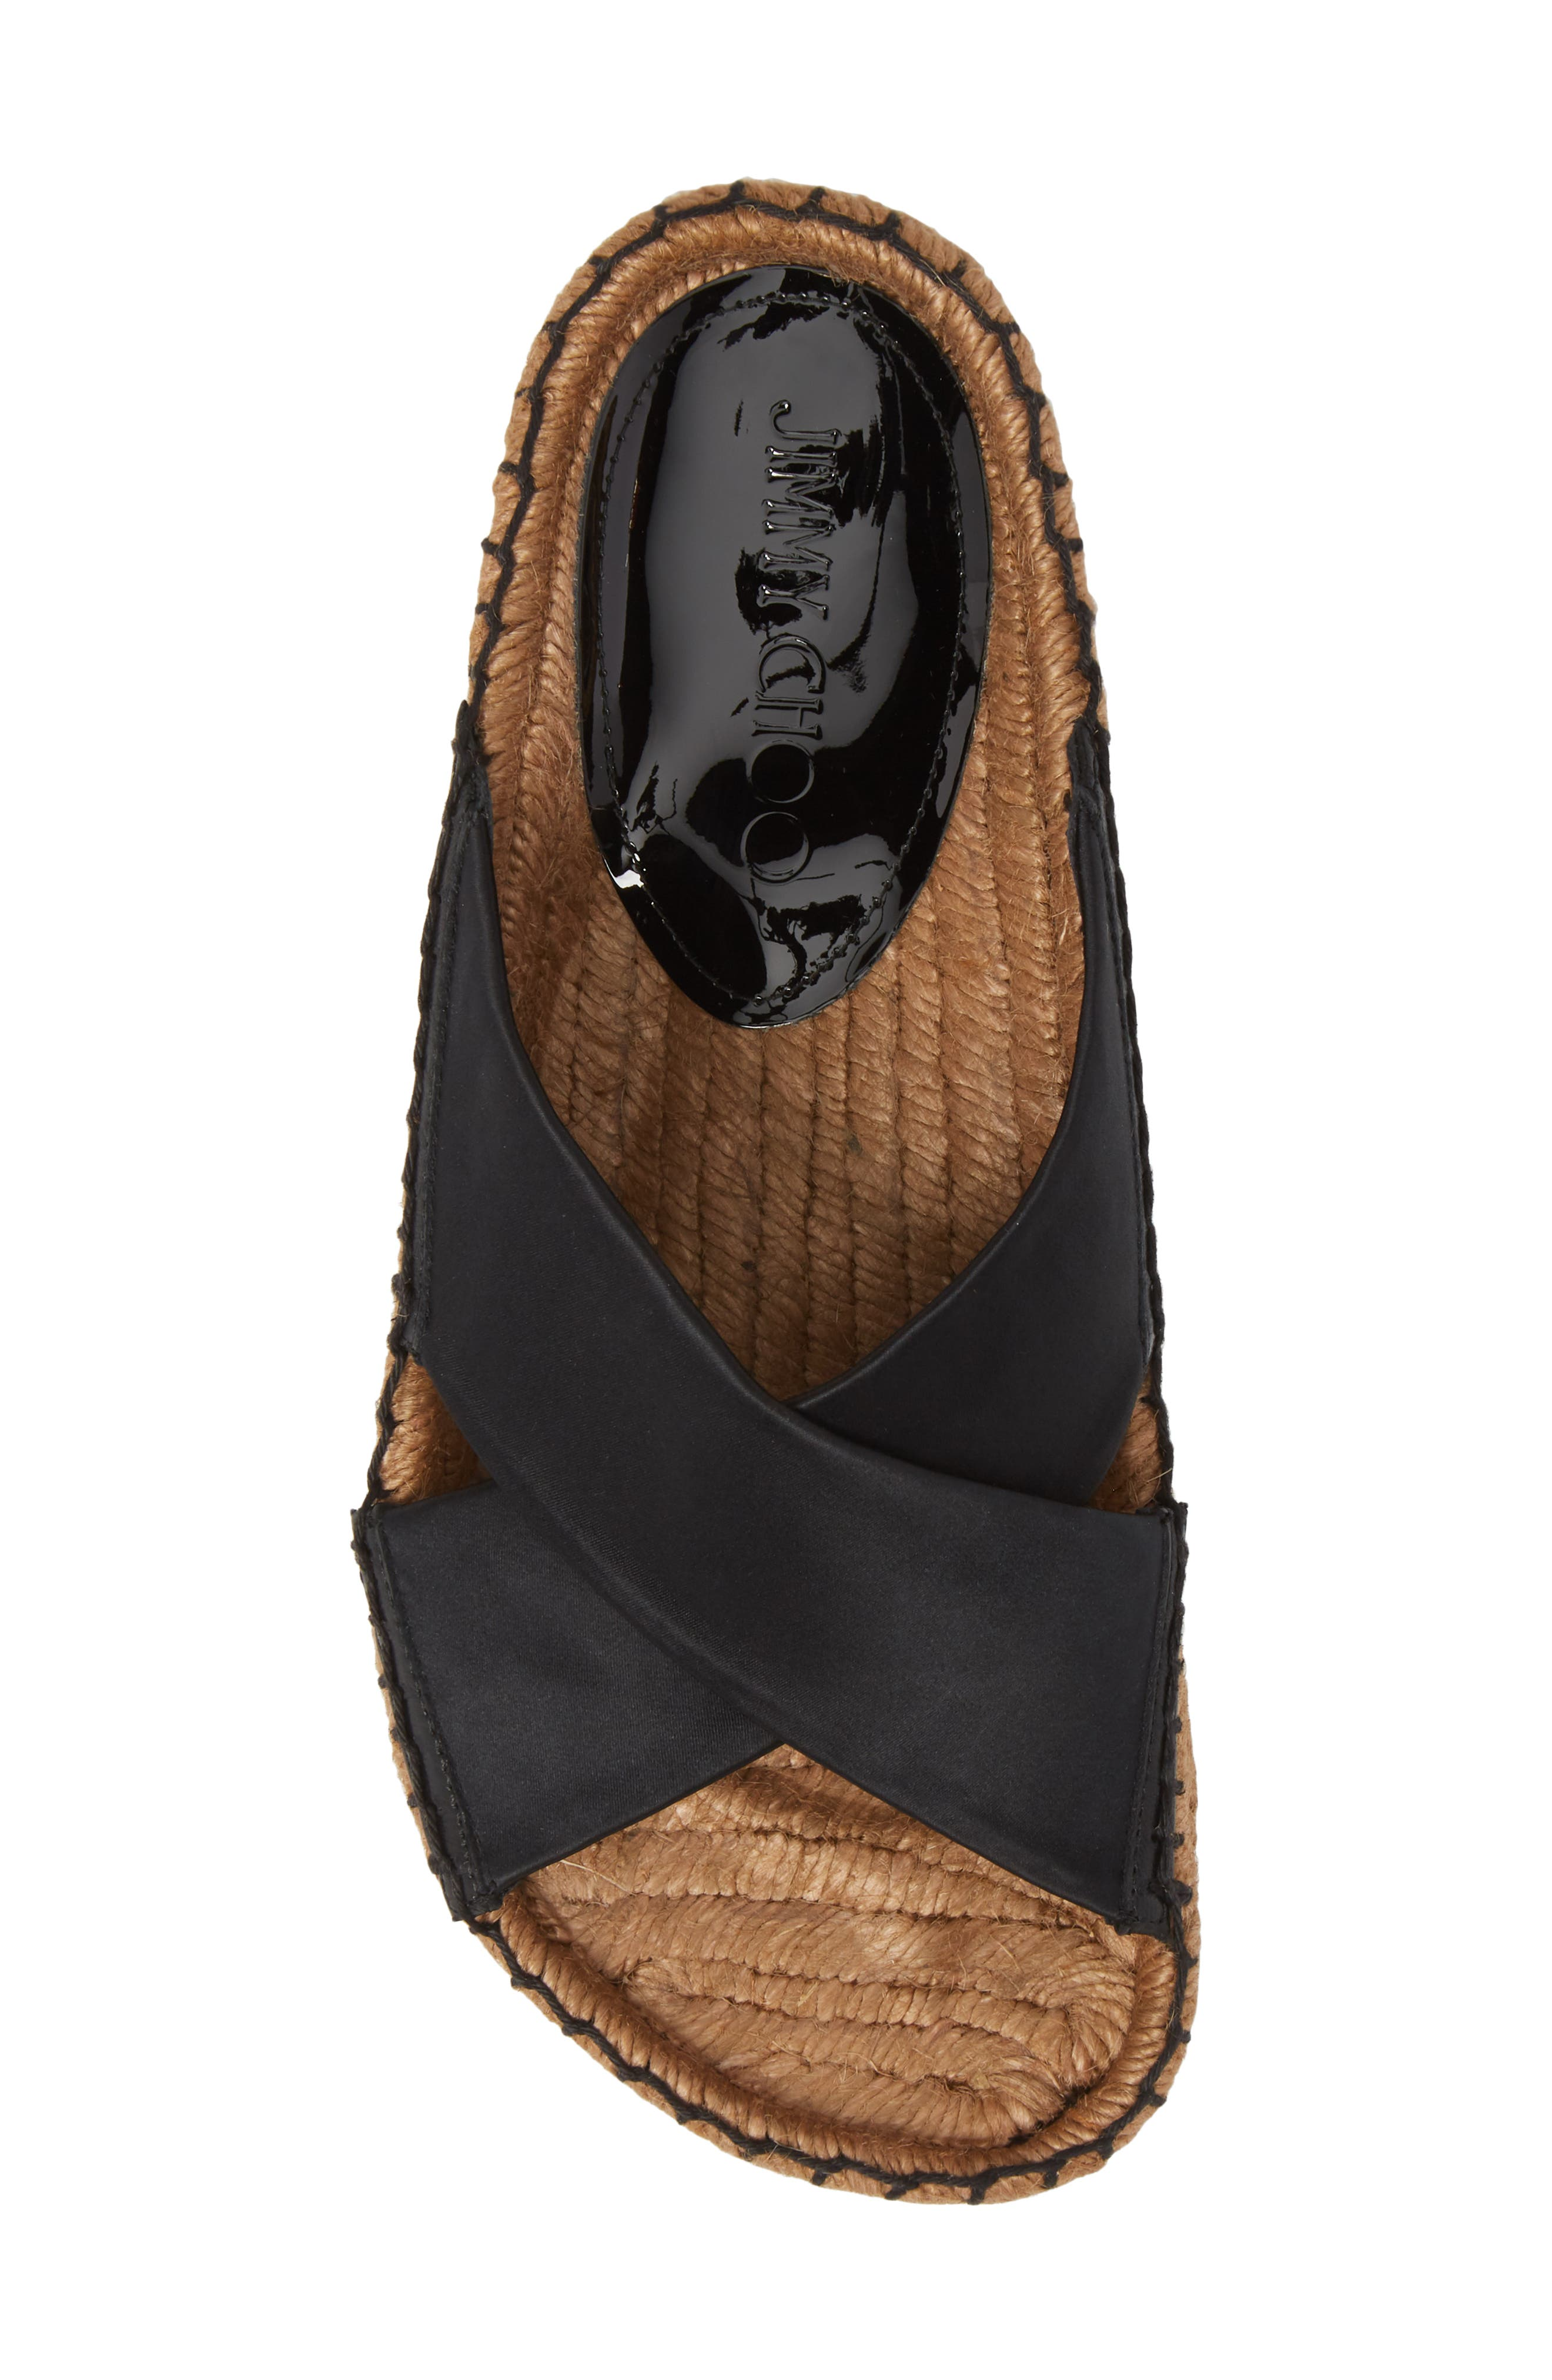 Danae Double Strap Espadrille Slide Sandal,                             Alternate thumbnail 5, color,                             Black